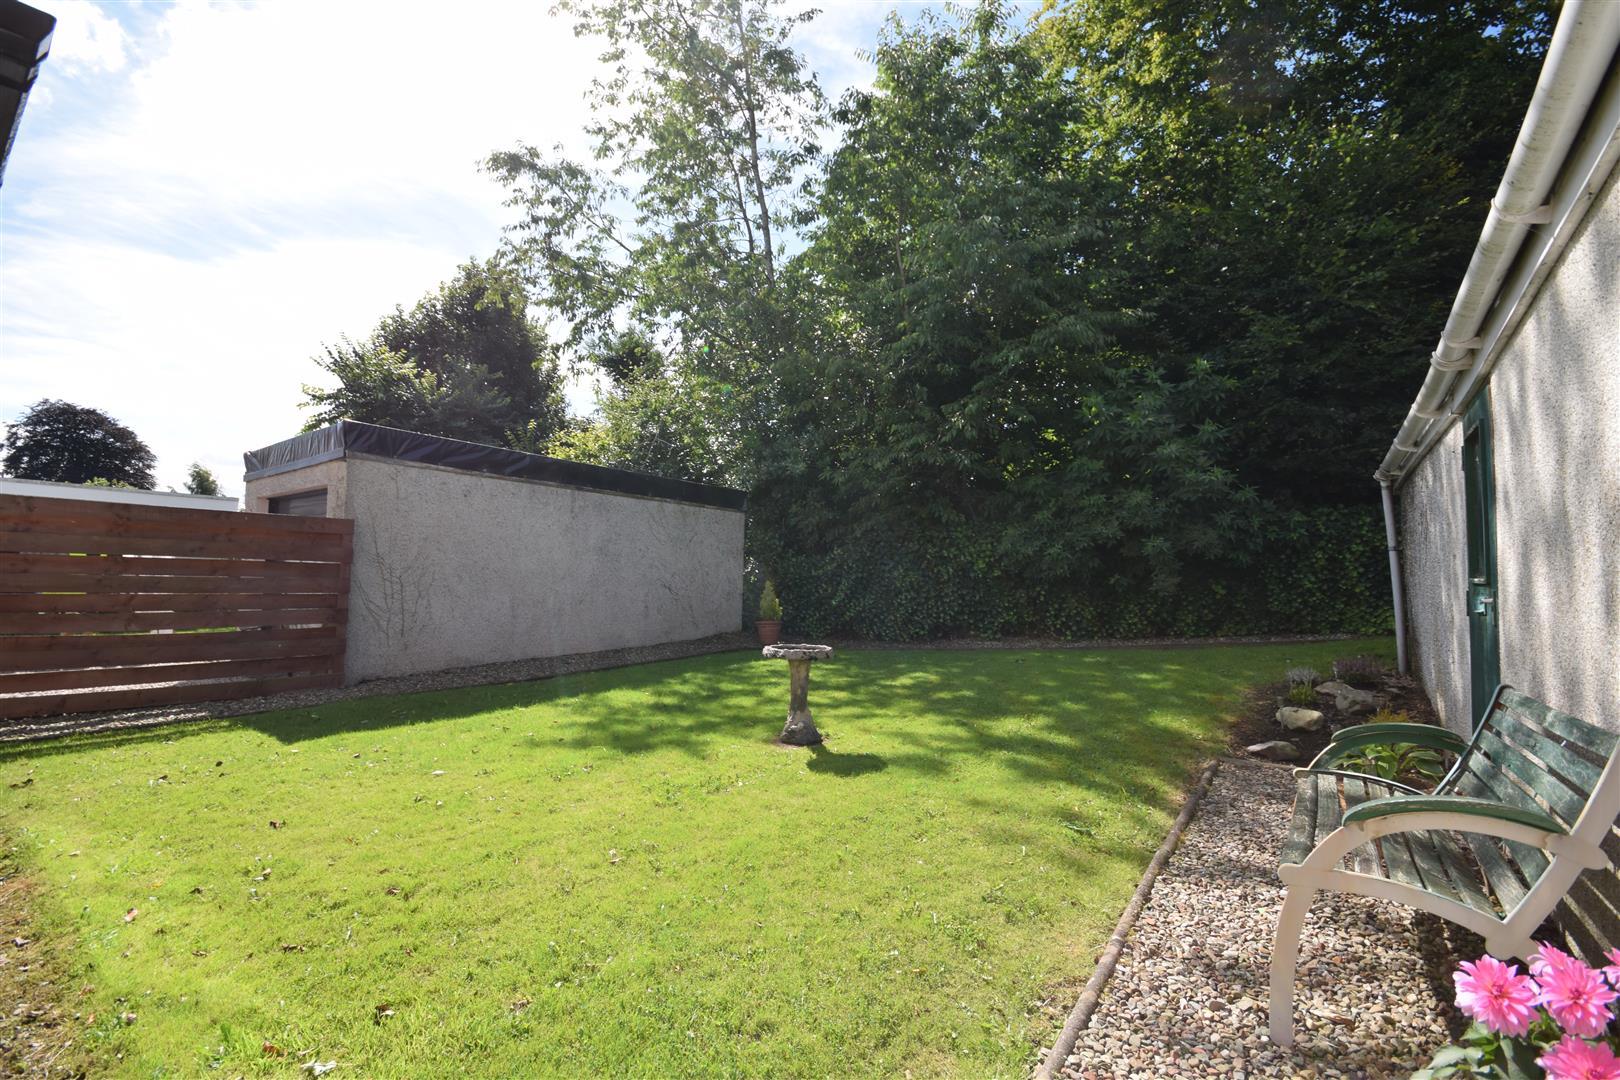 12, Cedar Avenue, Blairgowrie, Perthshire, PH10 6TT, UK